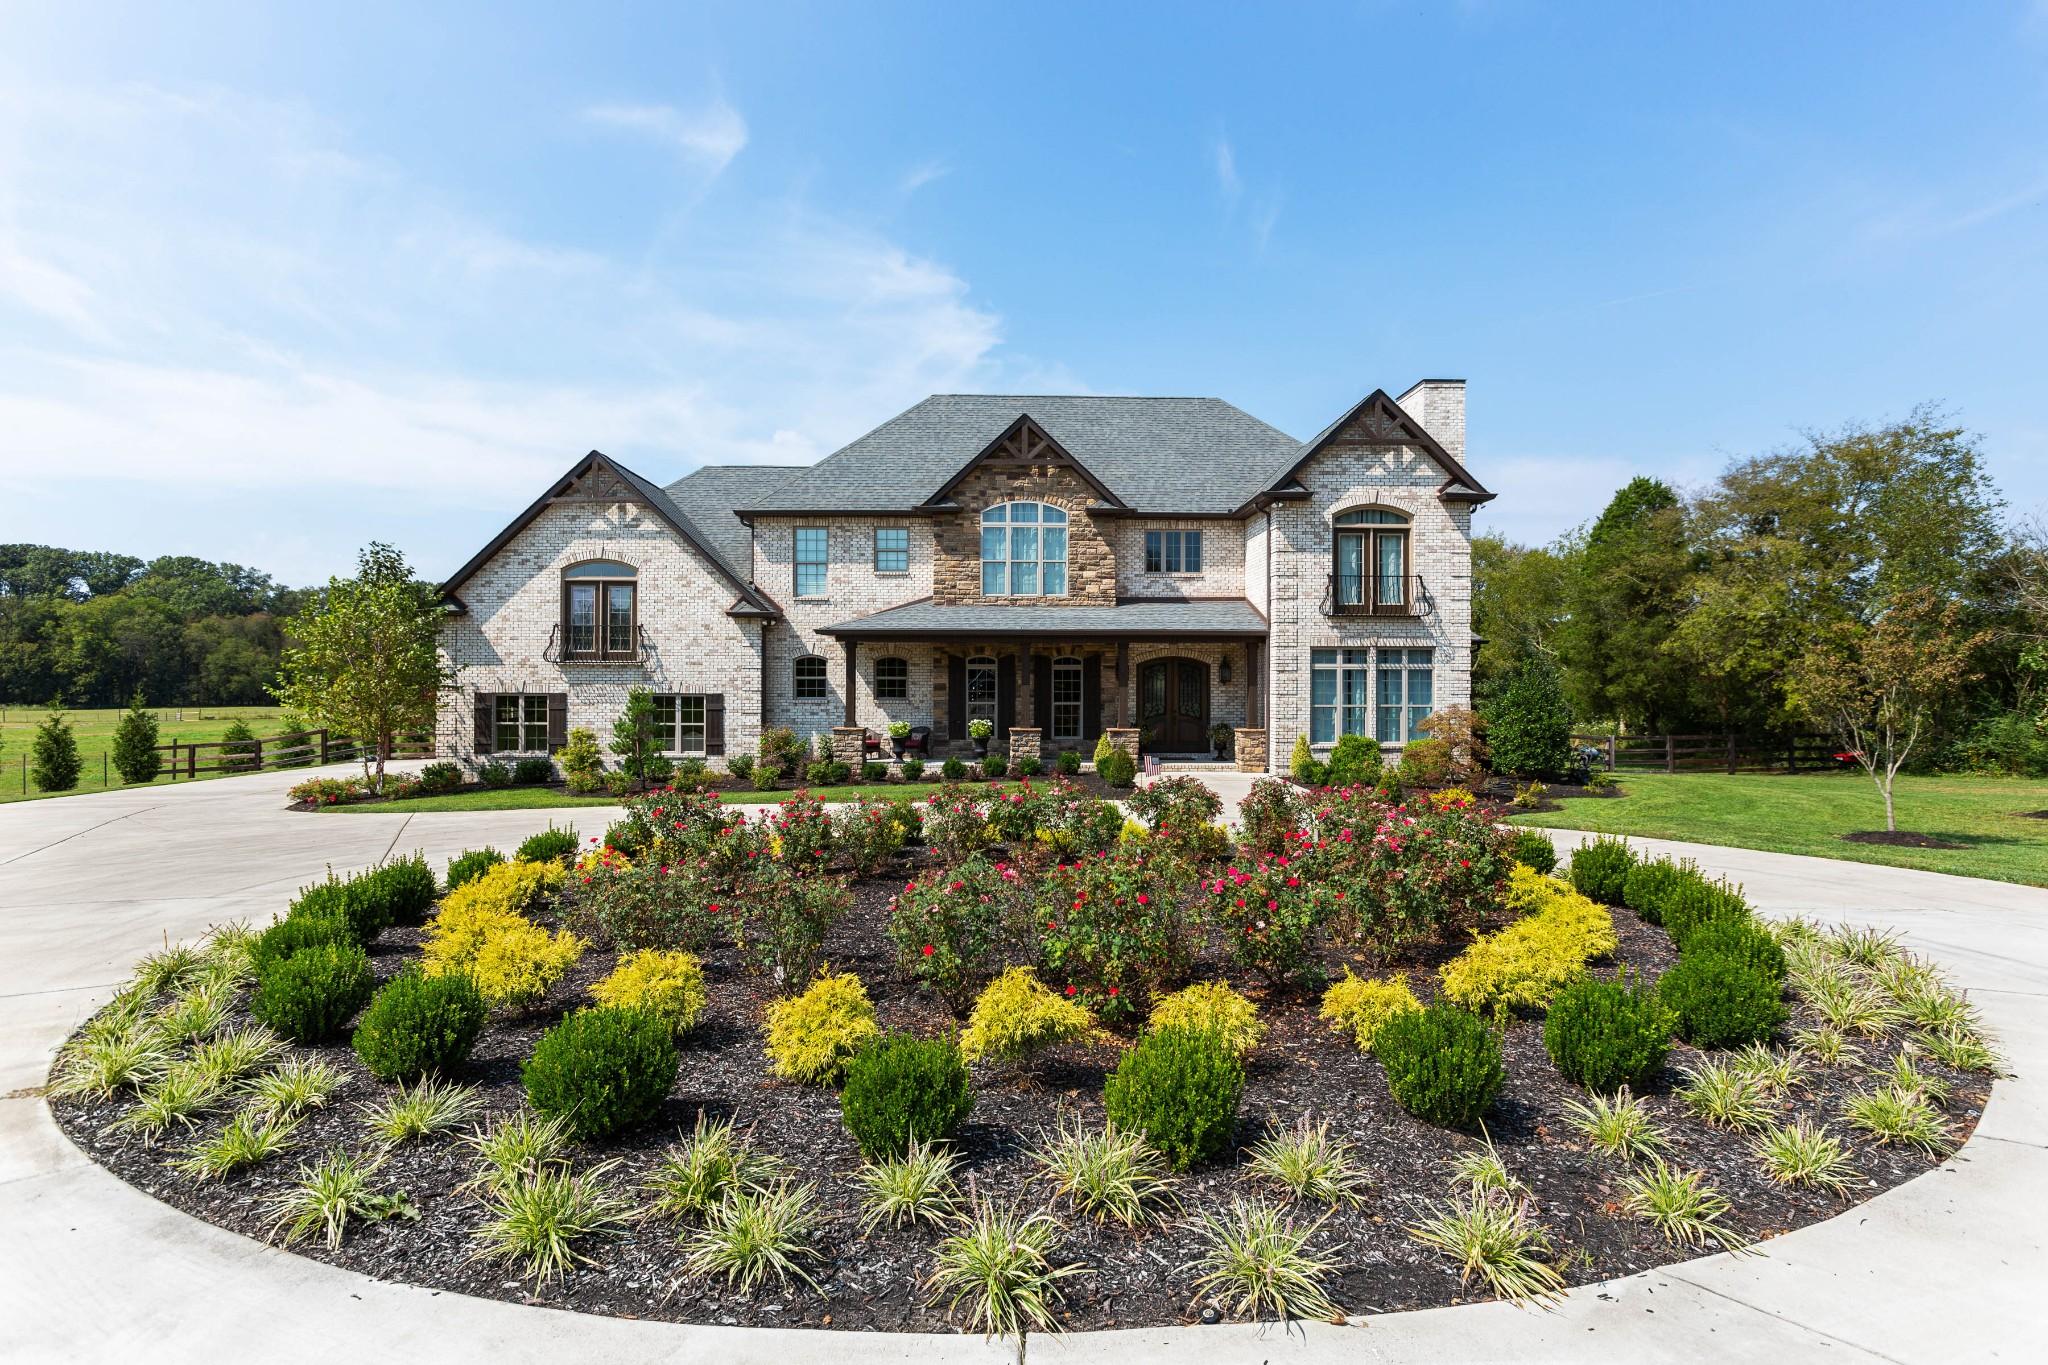 271 Kirk Ln Property Photo - Gallatin, TN real estate listing